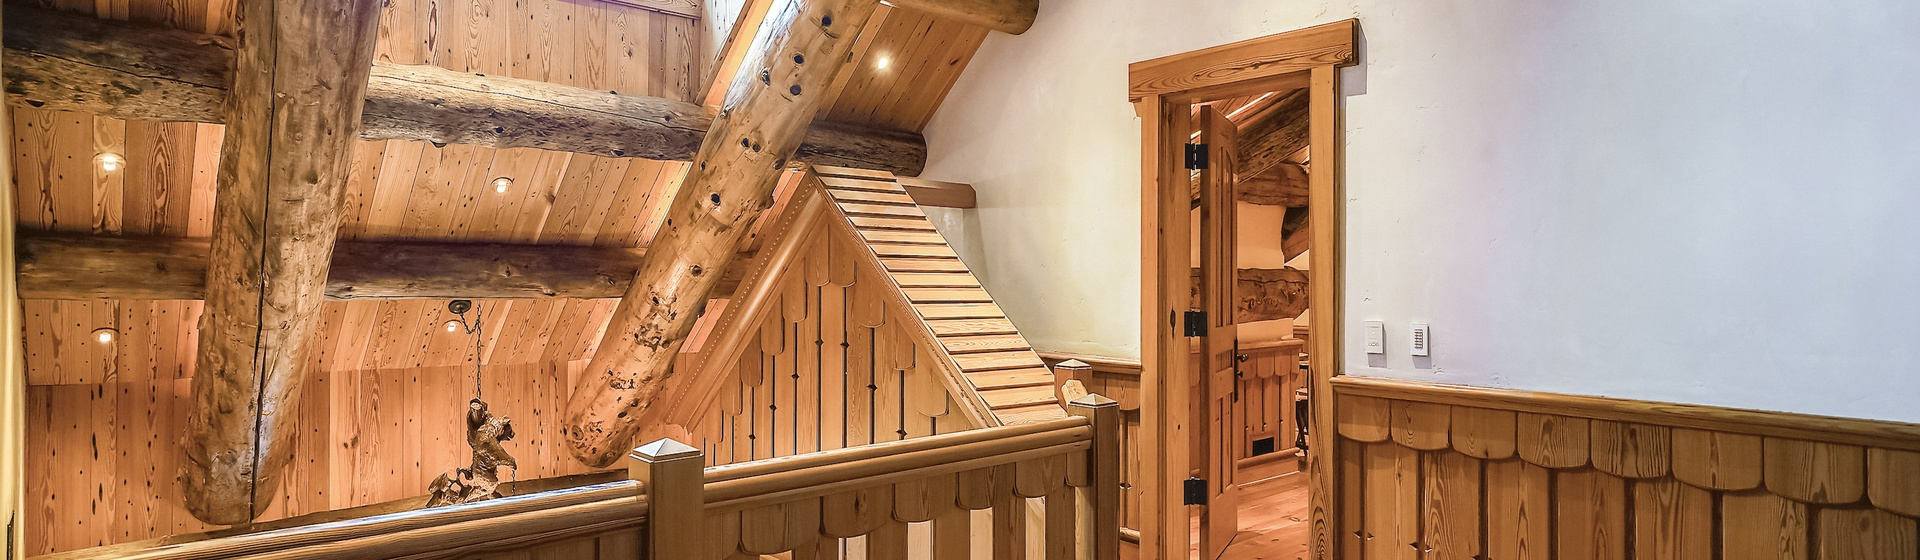 9.12-Telluride-Sleeping-Indian-Ranch-Swiss-Suite-Loft-Sitting-Area-2-web.JPG